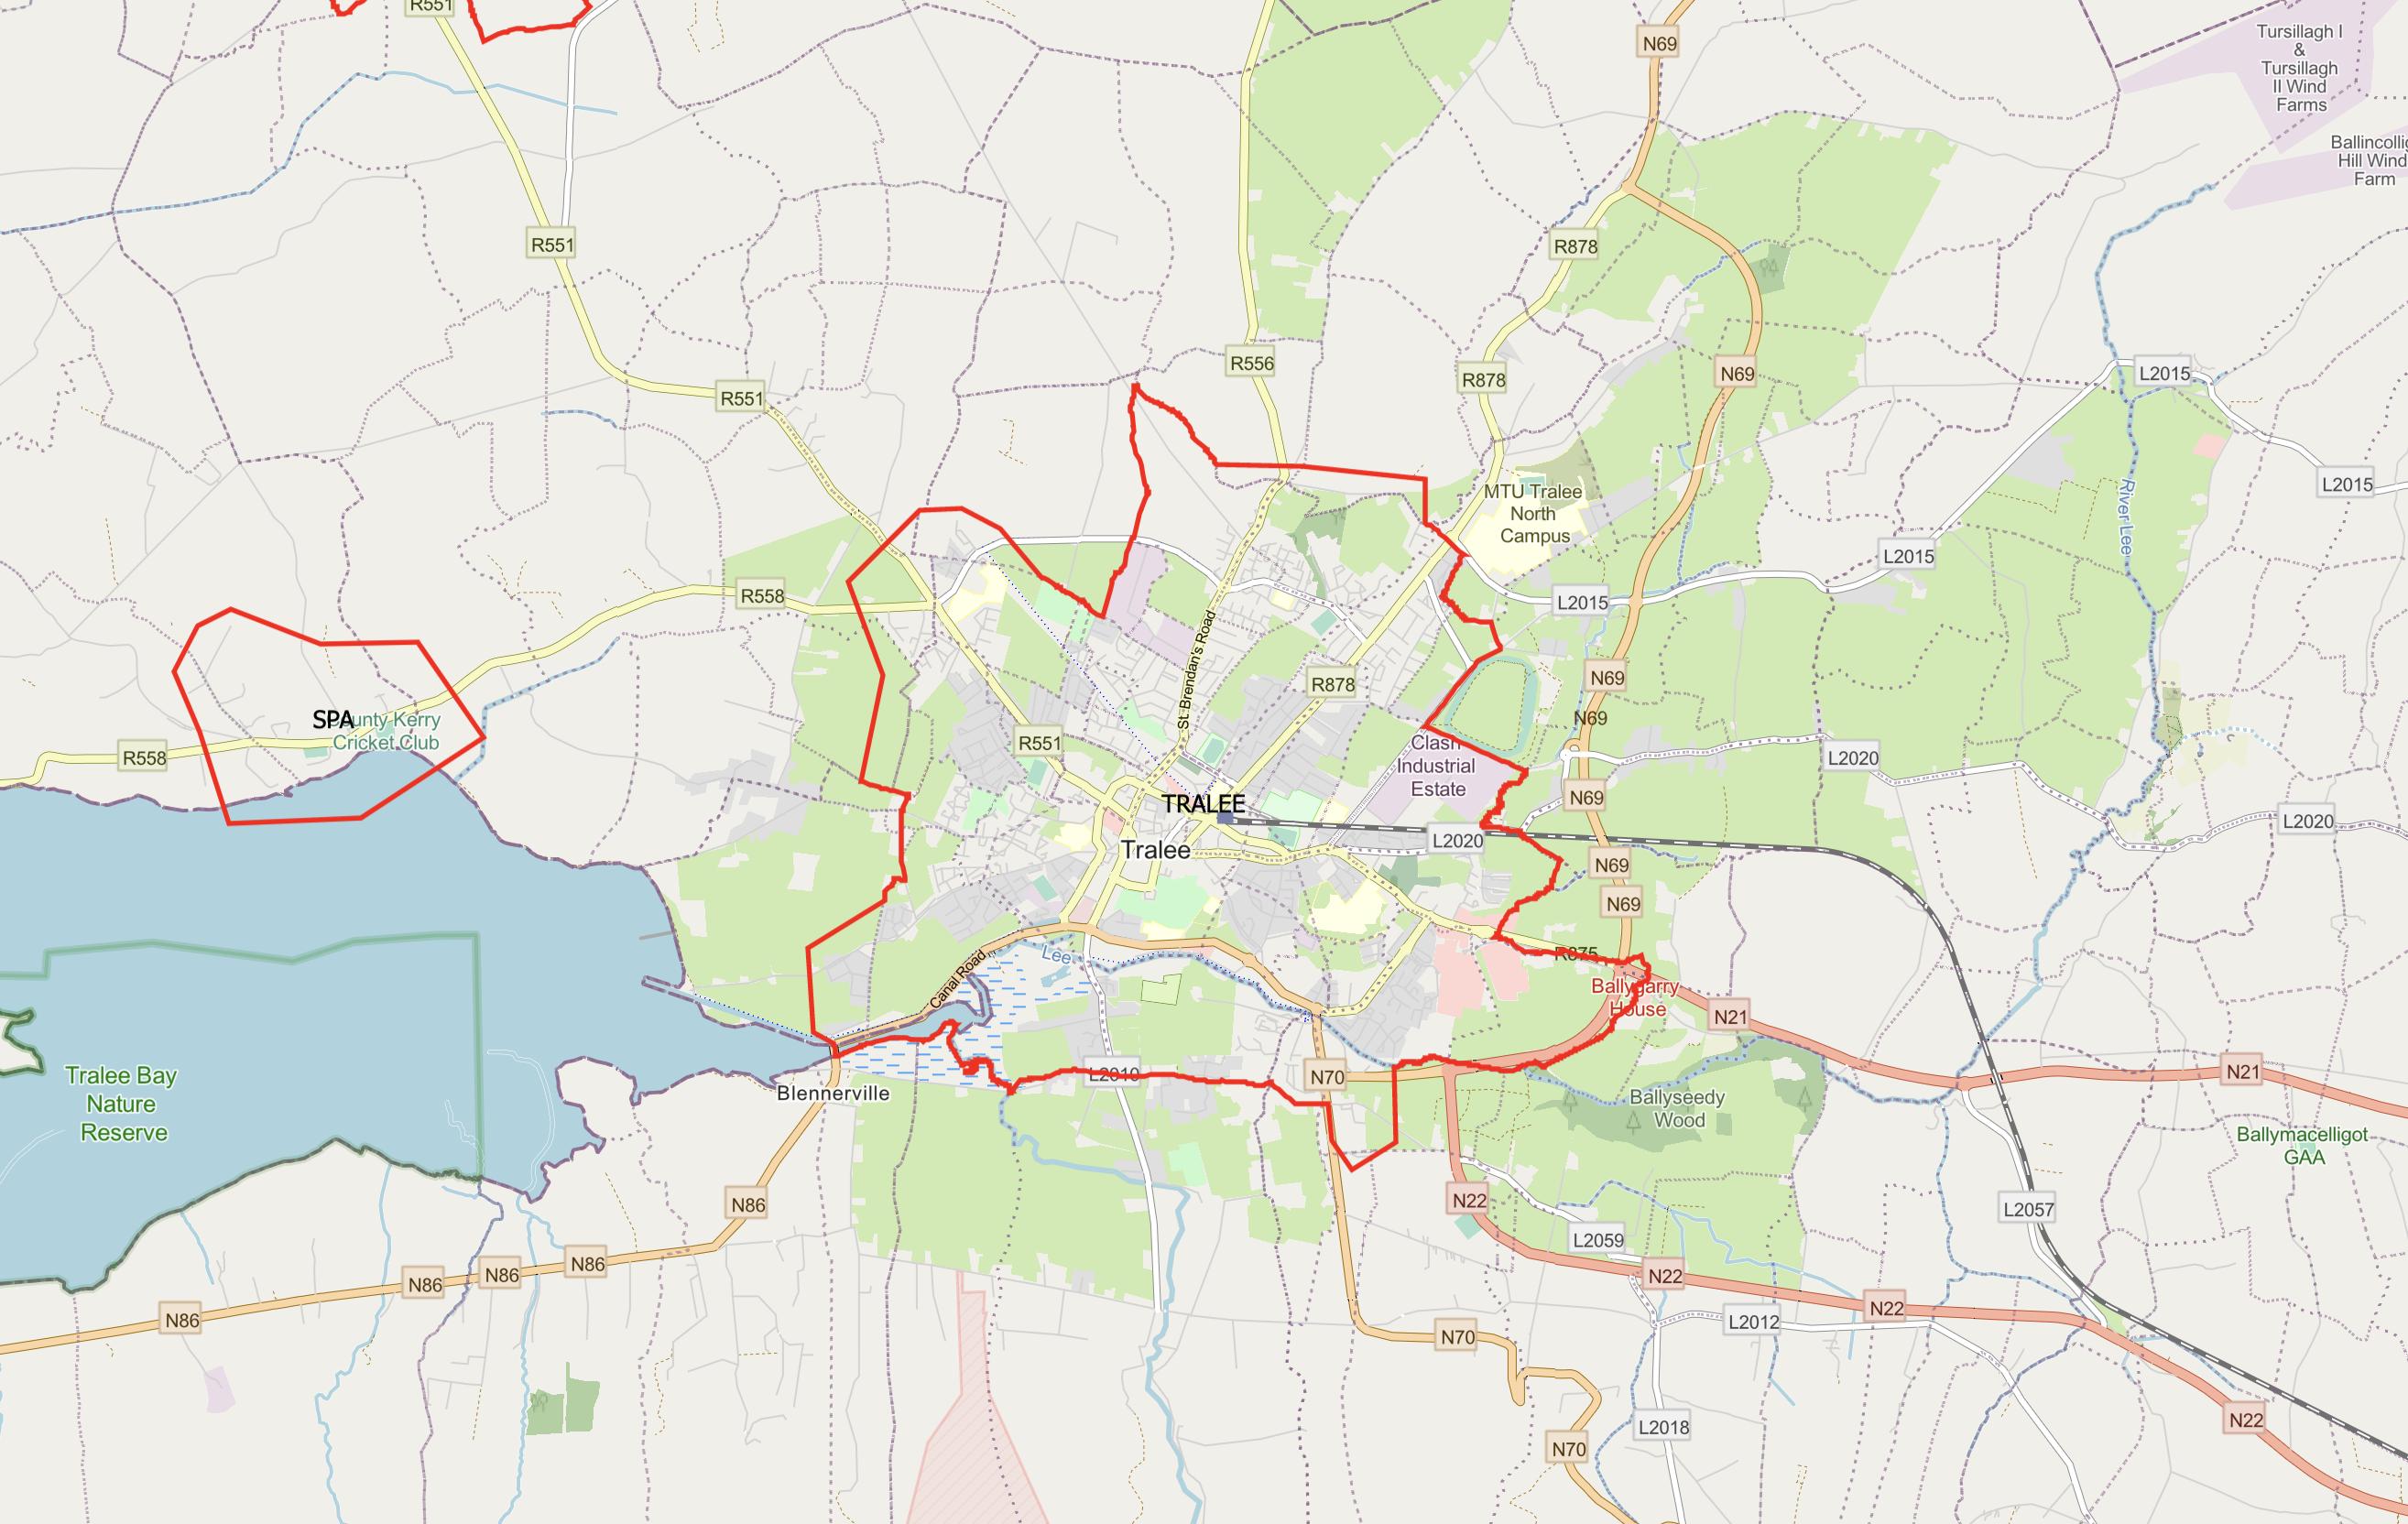 solar-panels-tralee-kerry-ireland-map-img